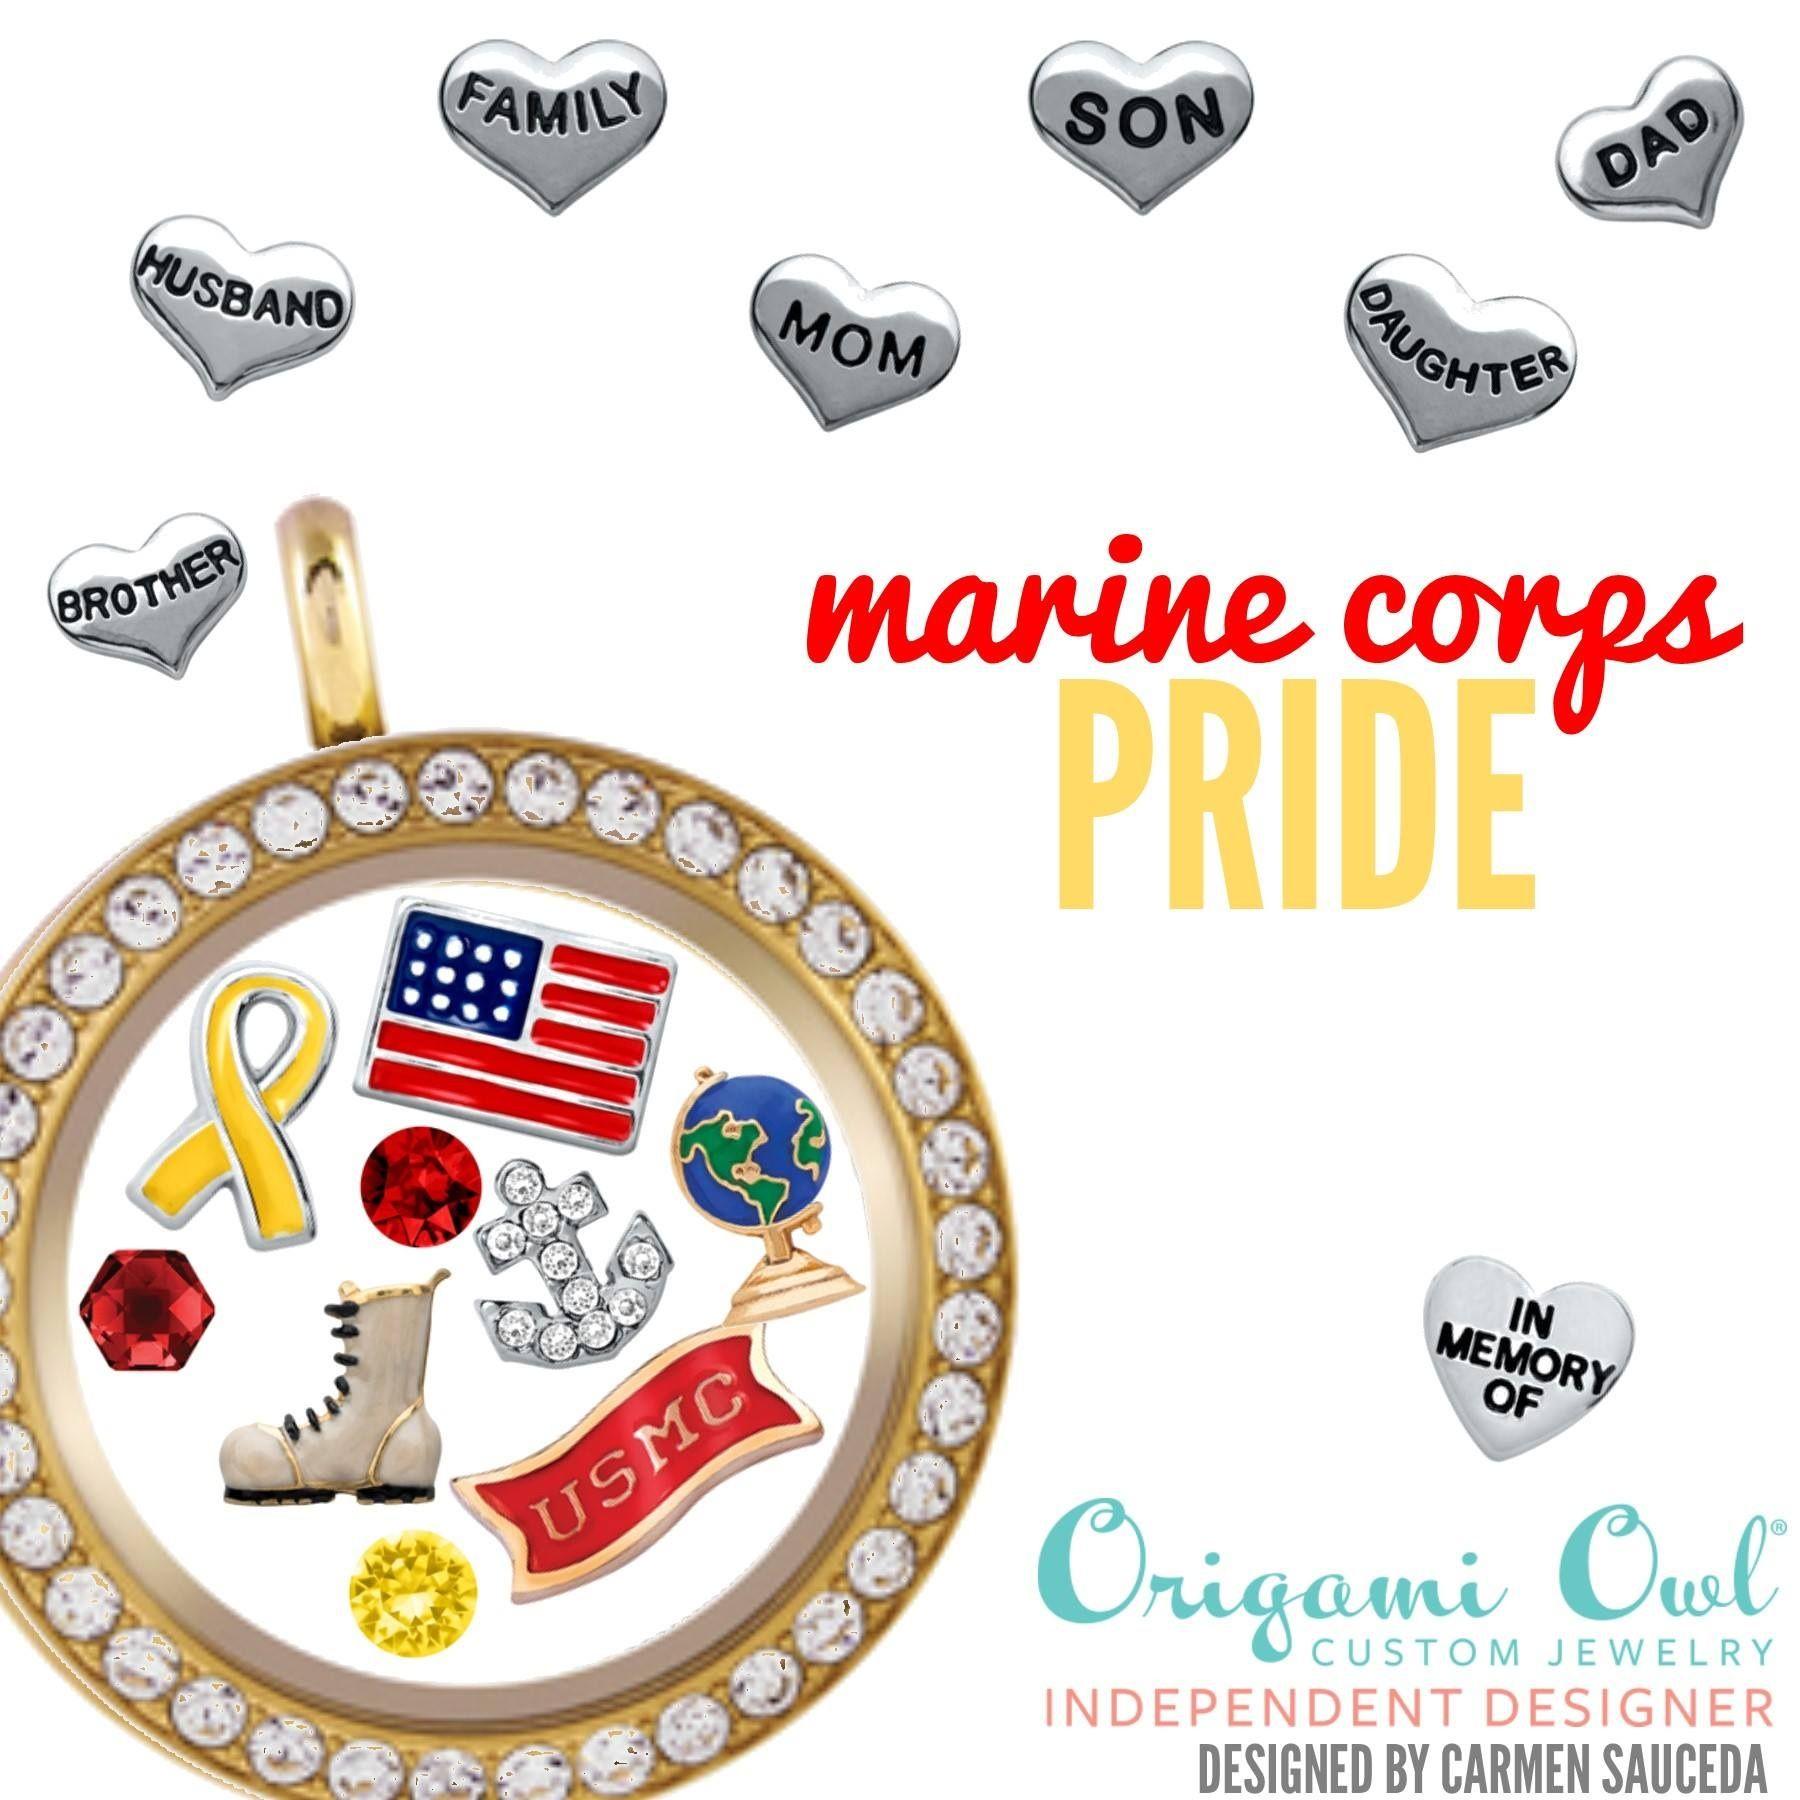 Usmc marine corps pride origami owl locket perfect for wife usmc marine corps pride origami owl locket perfect for wife brother girlfriend nvjuhfo Gallery